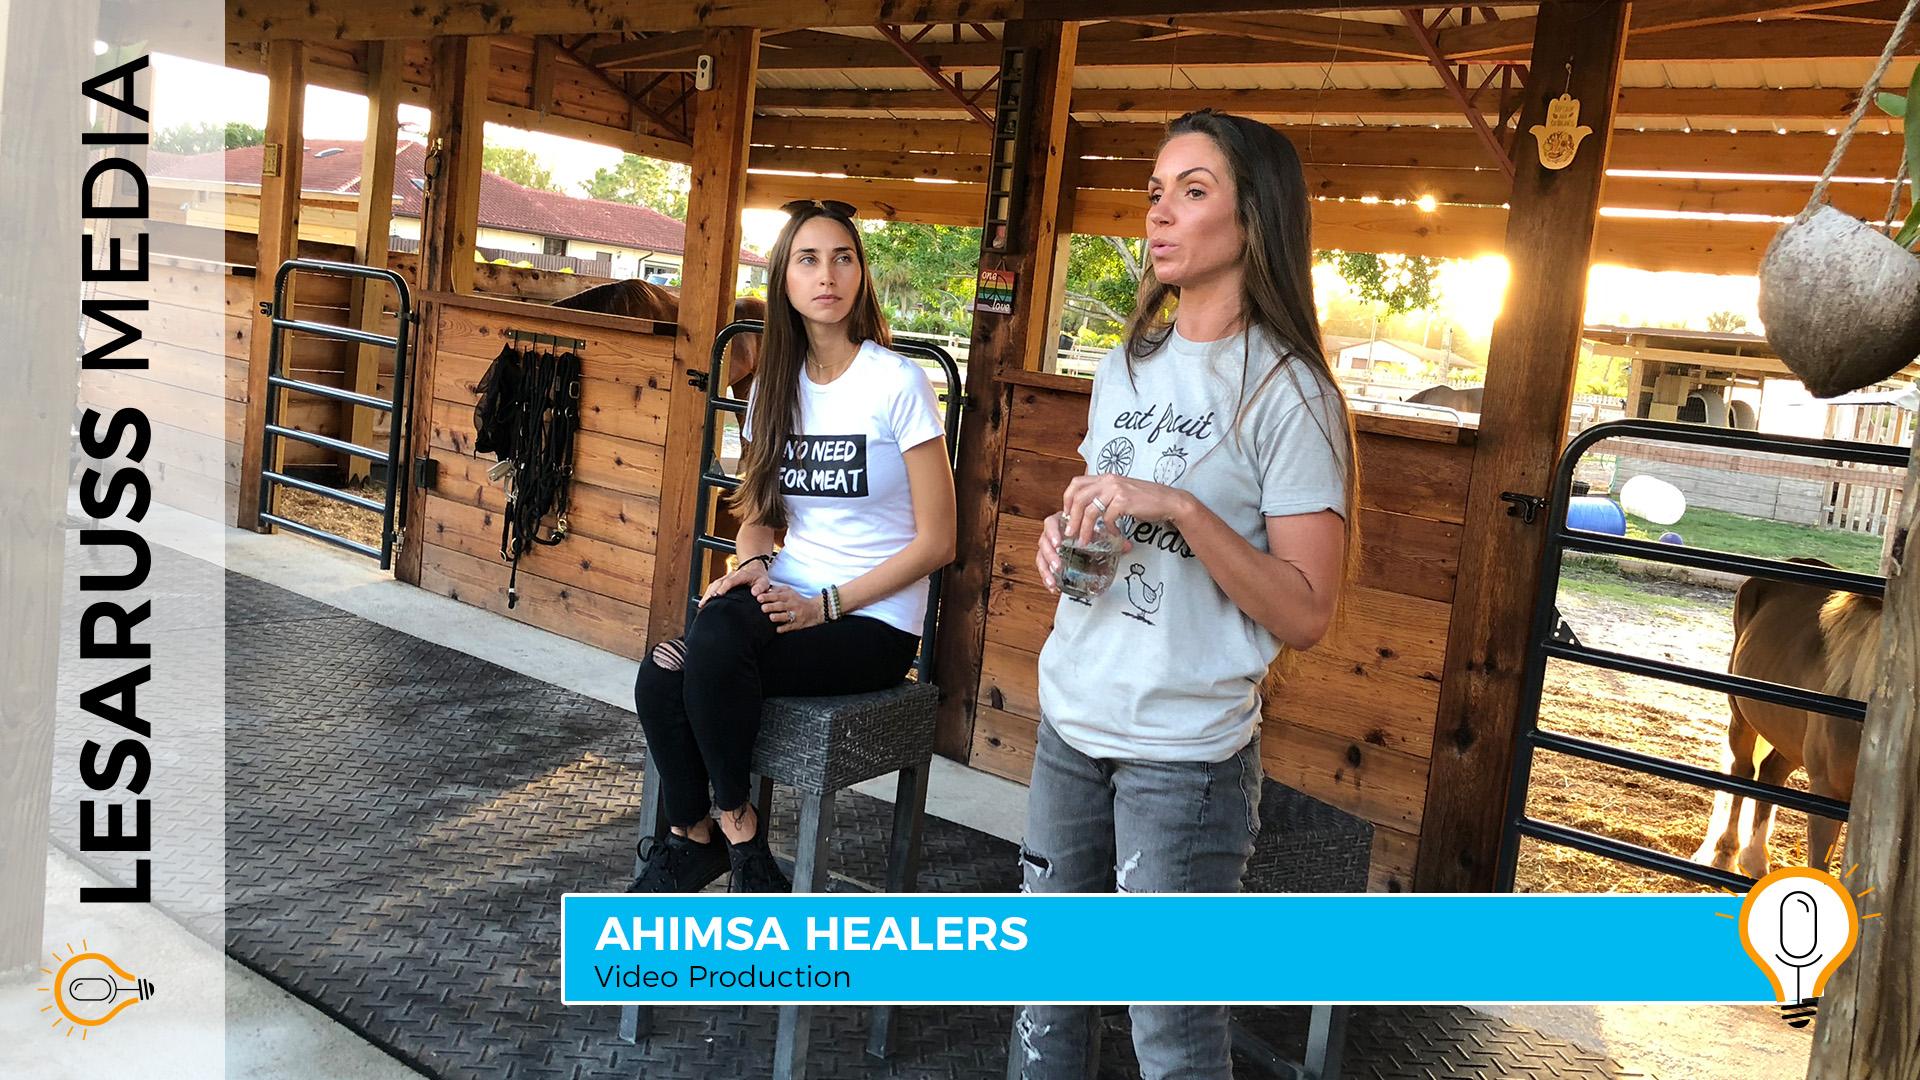 Ahimsa Healers